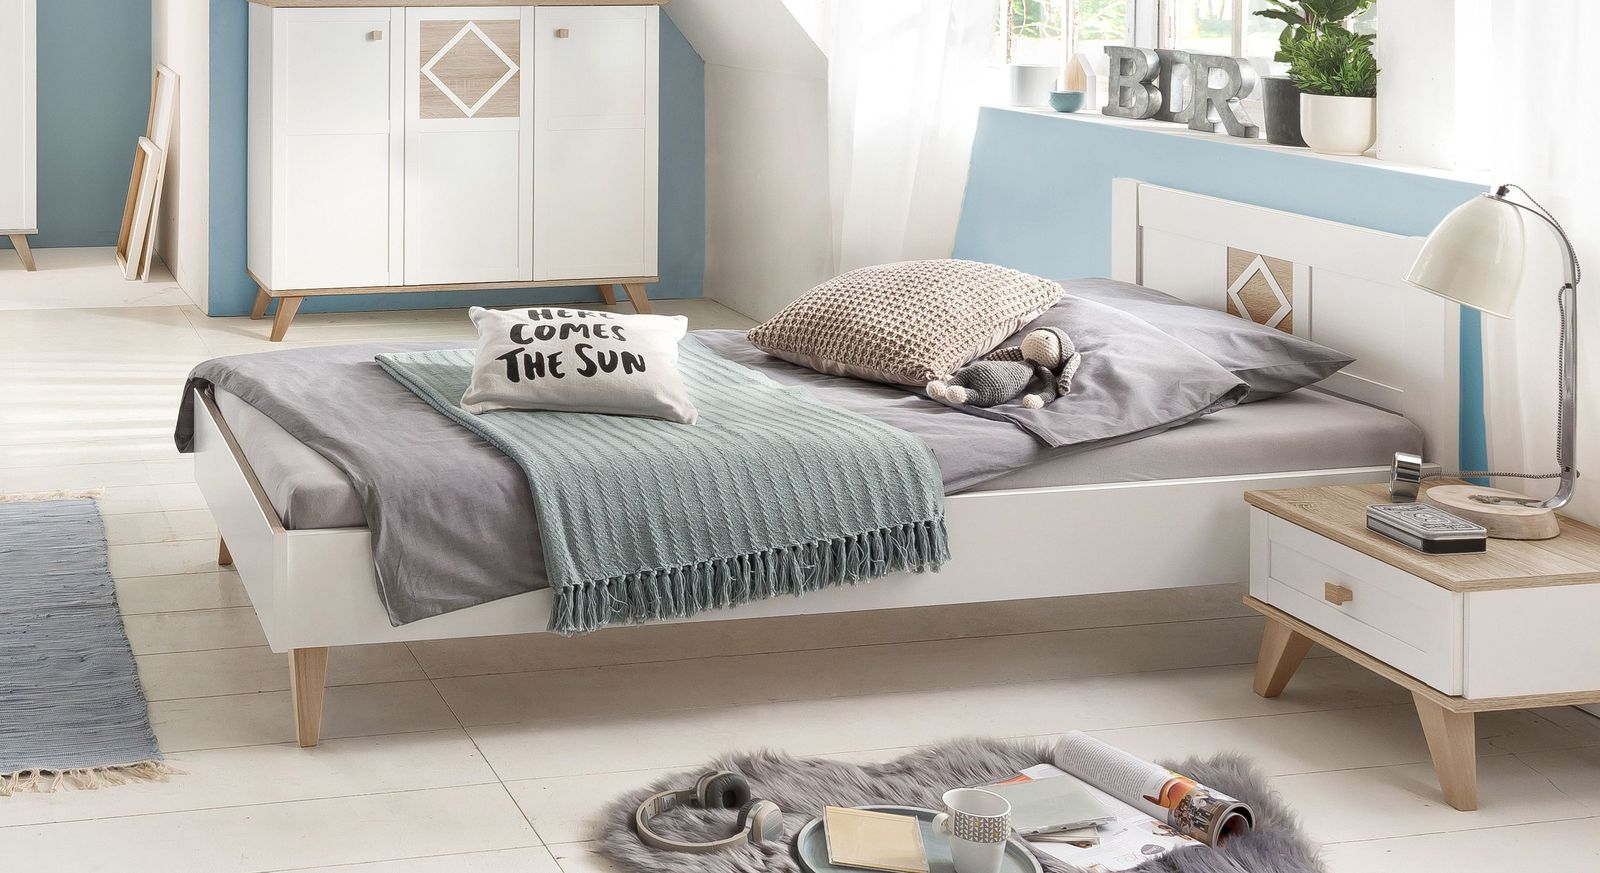 bett wei eiche great beste homestyleu polsterbett x doppelbett stoffbett fr doppelbett x wei. Black Bedroom Furniture Sets. Home Design Ideas